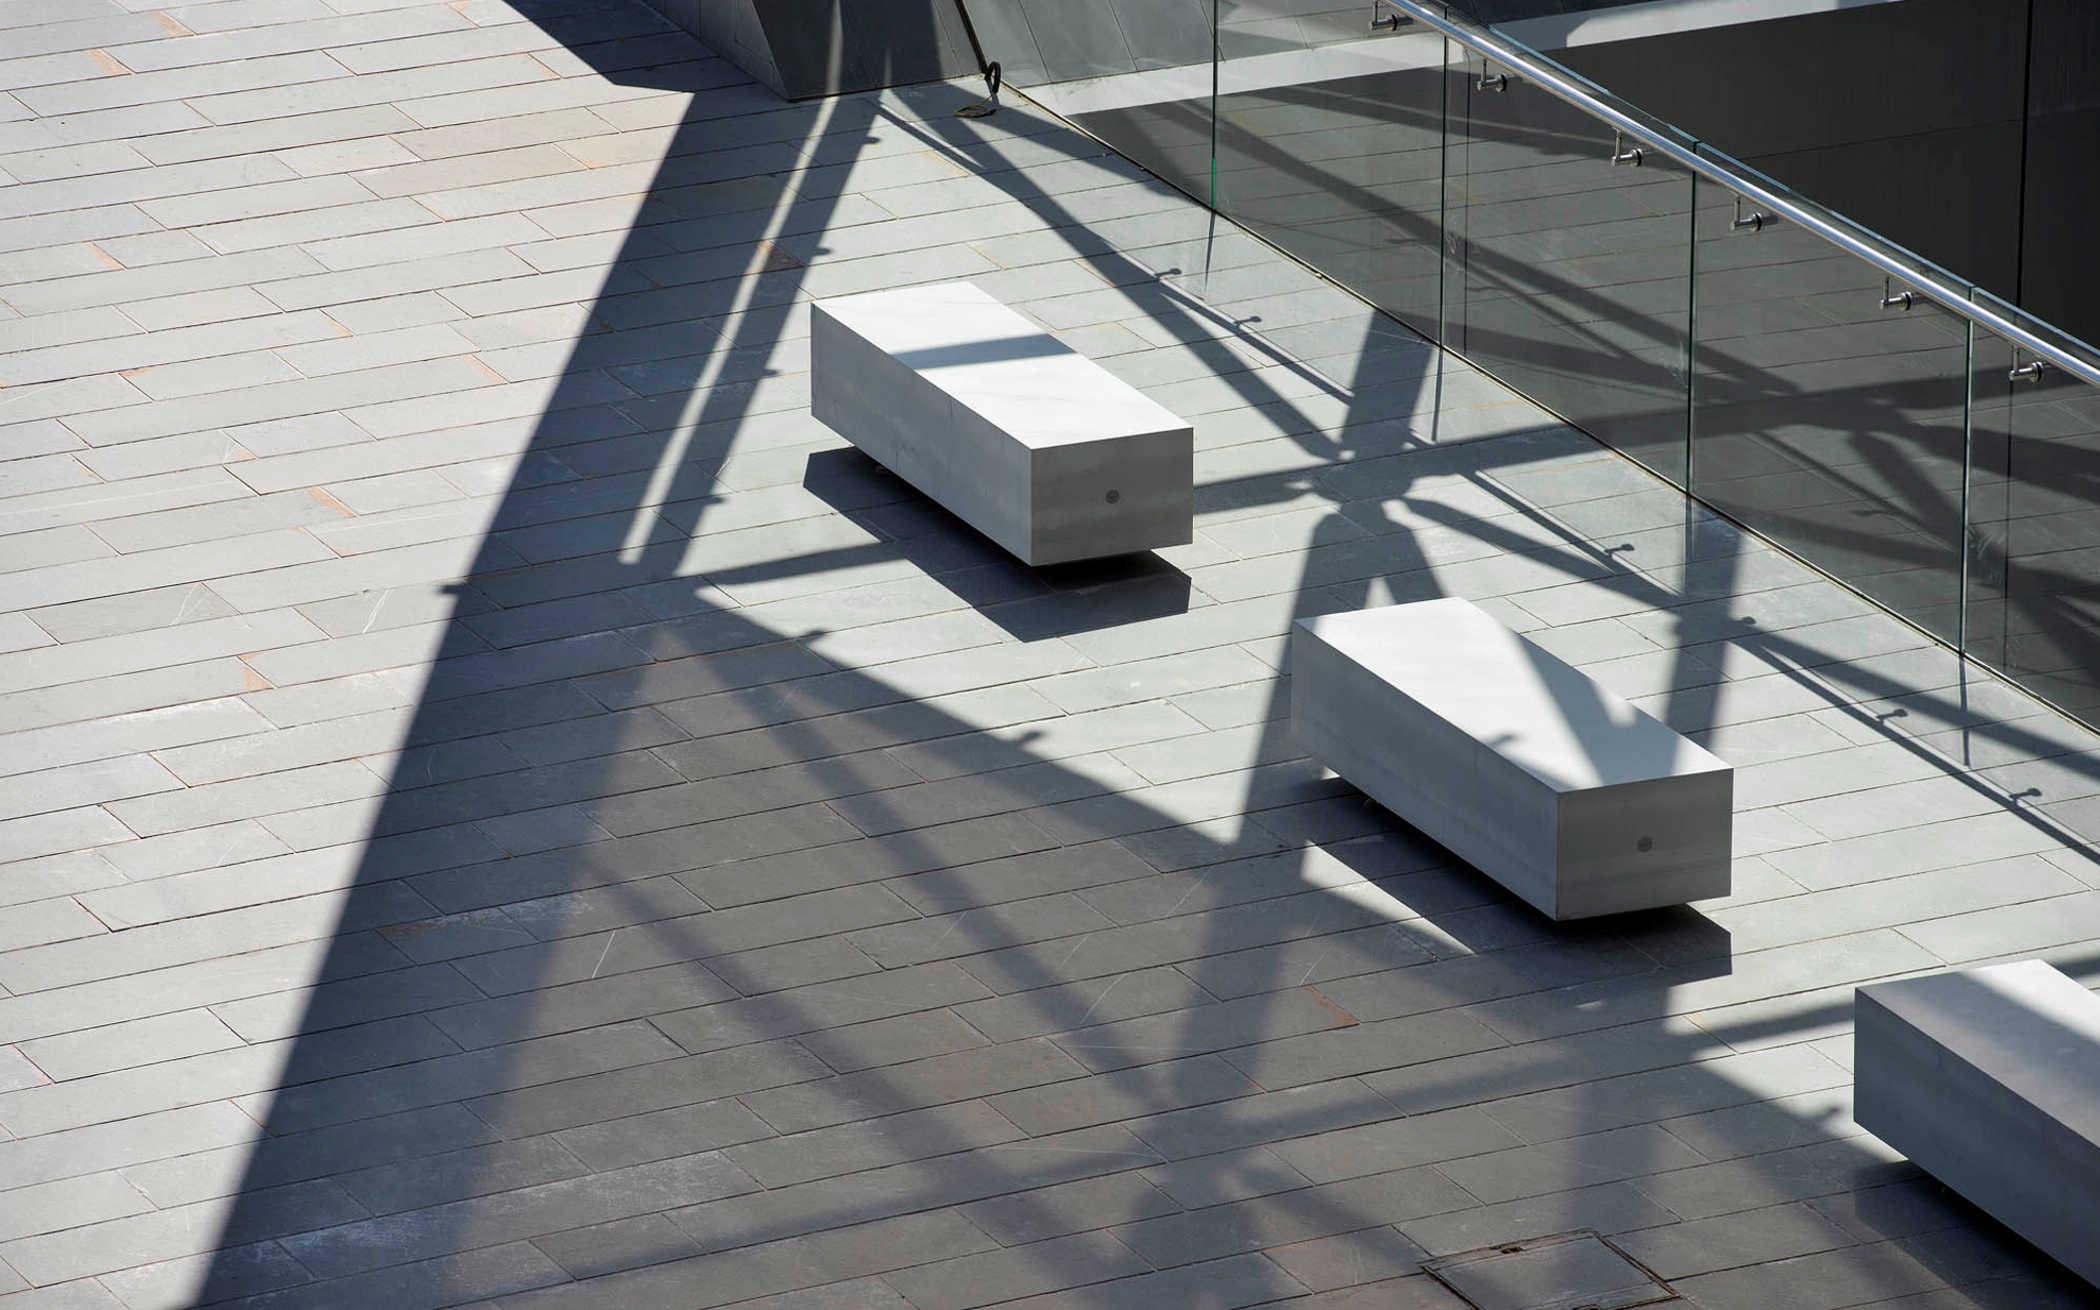 Metalco Department Giovanni De Sandre / Photo Projects